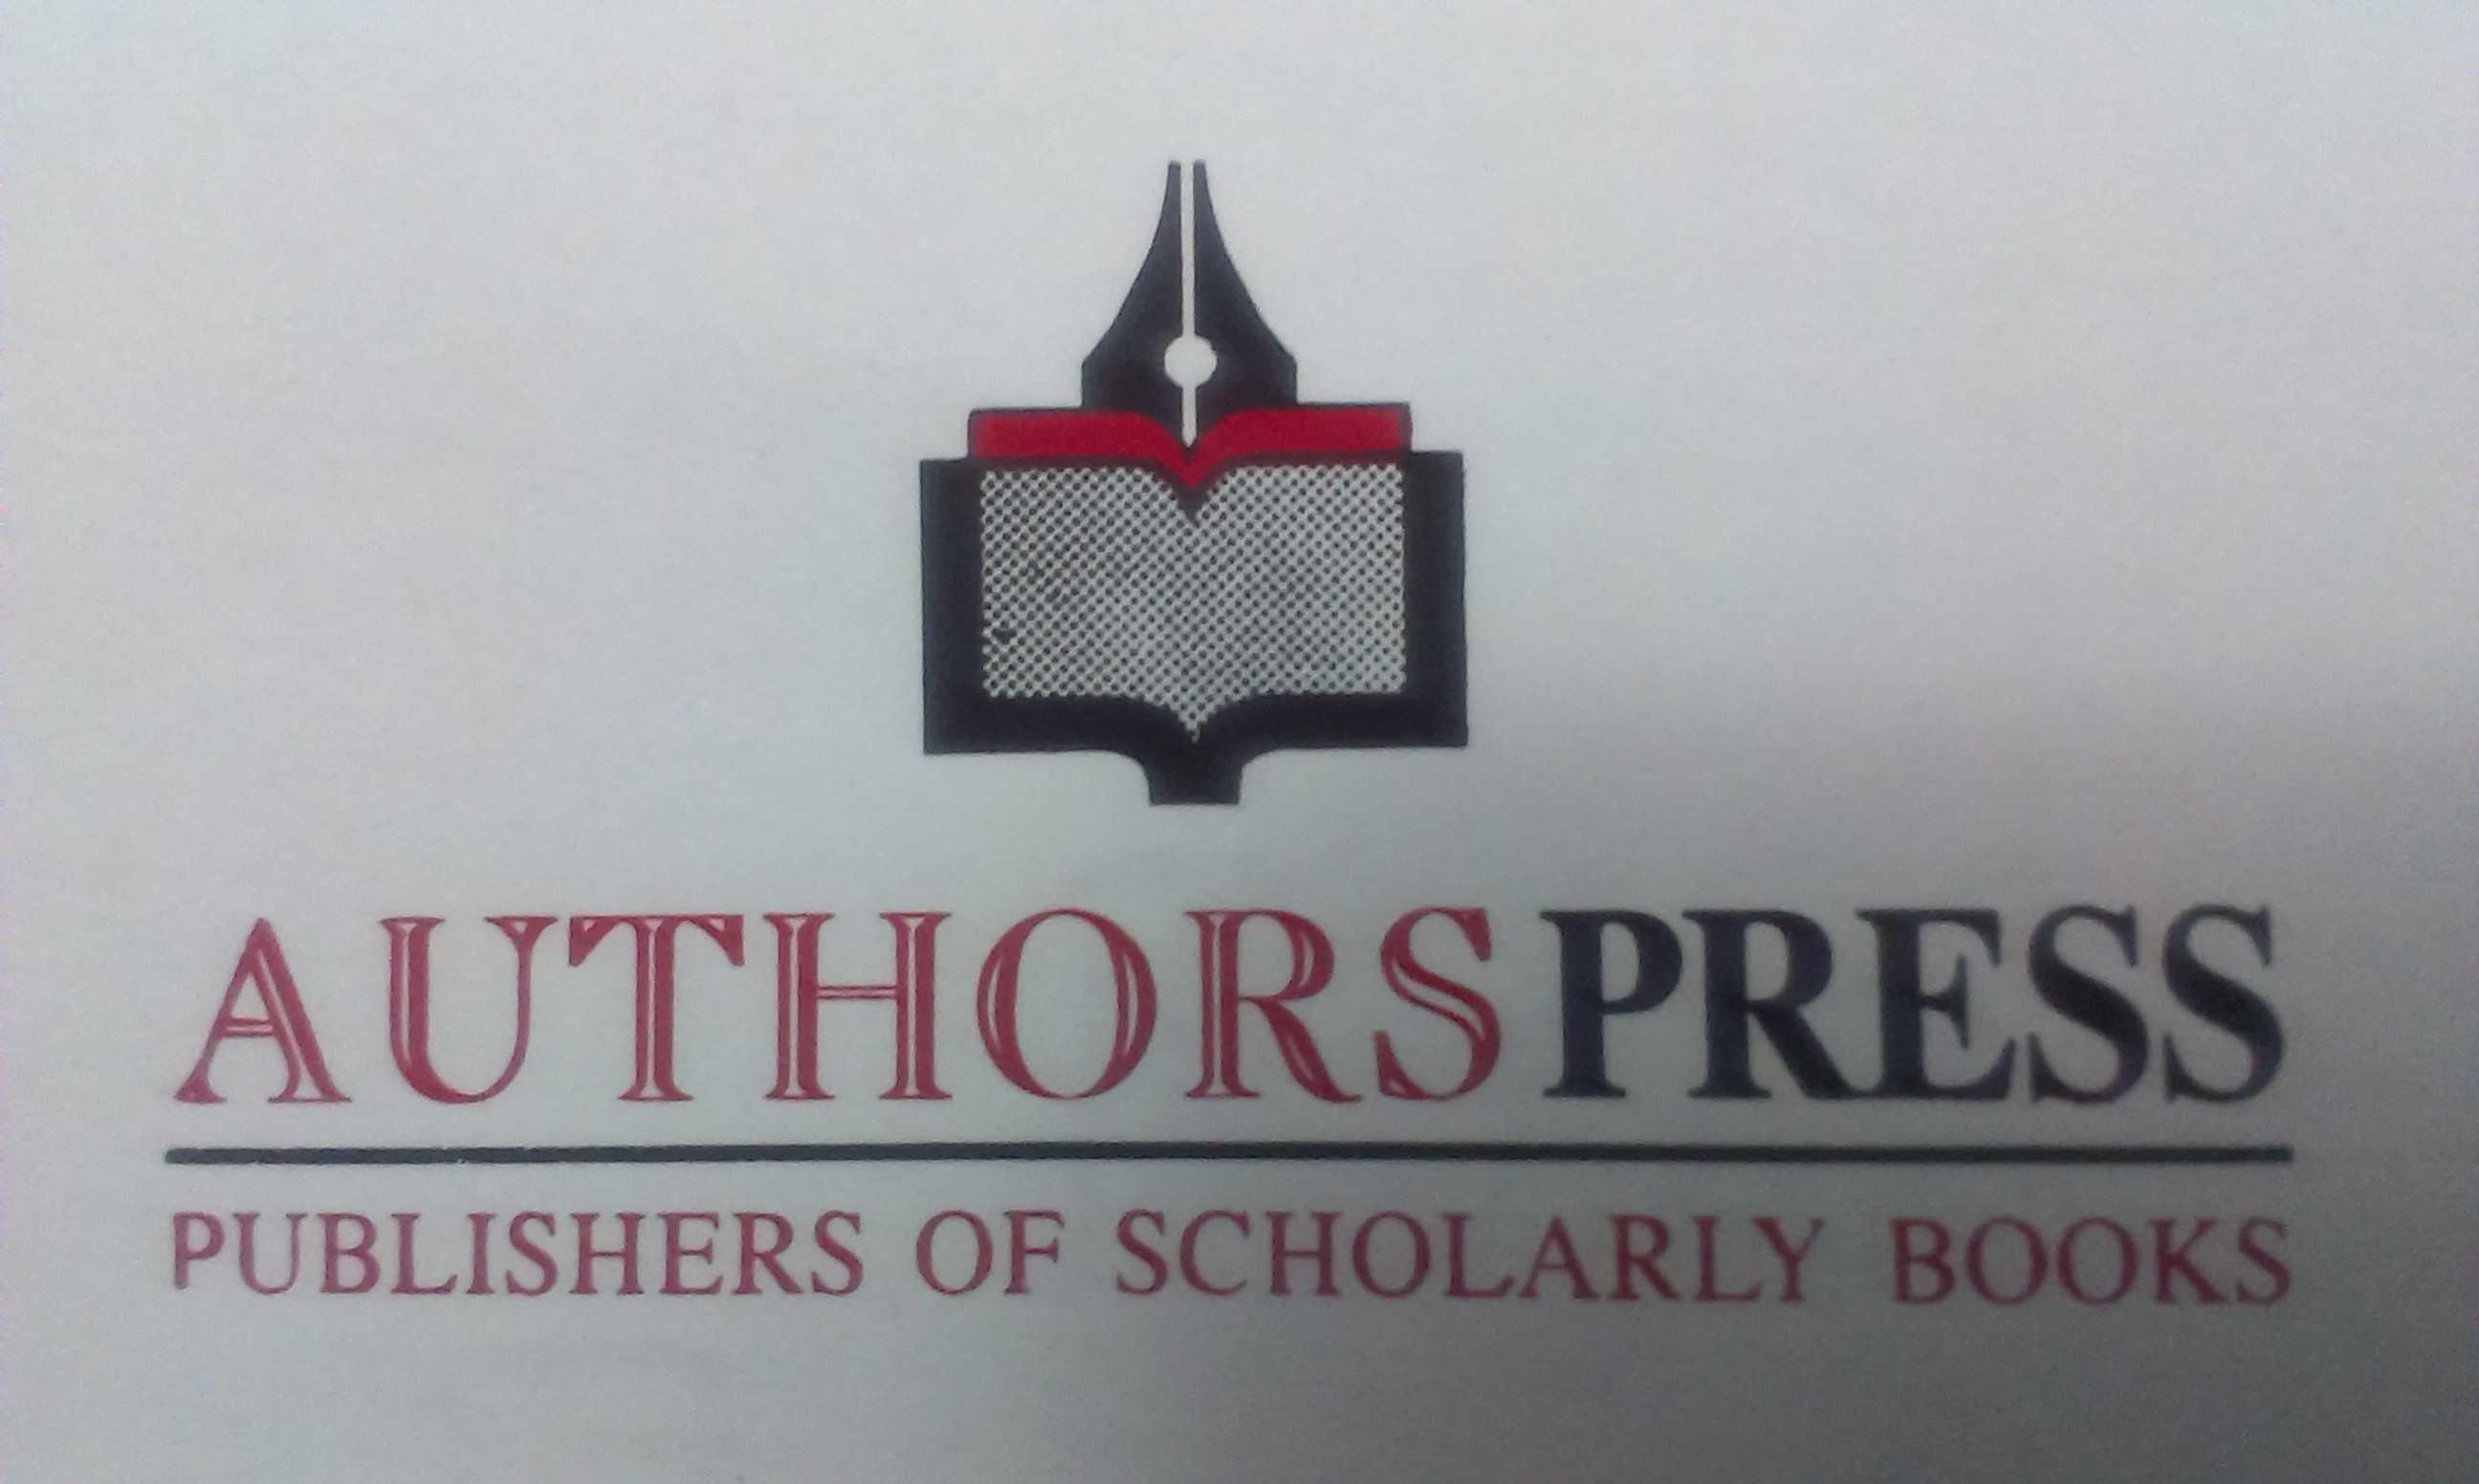 Author Press-fnbworld